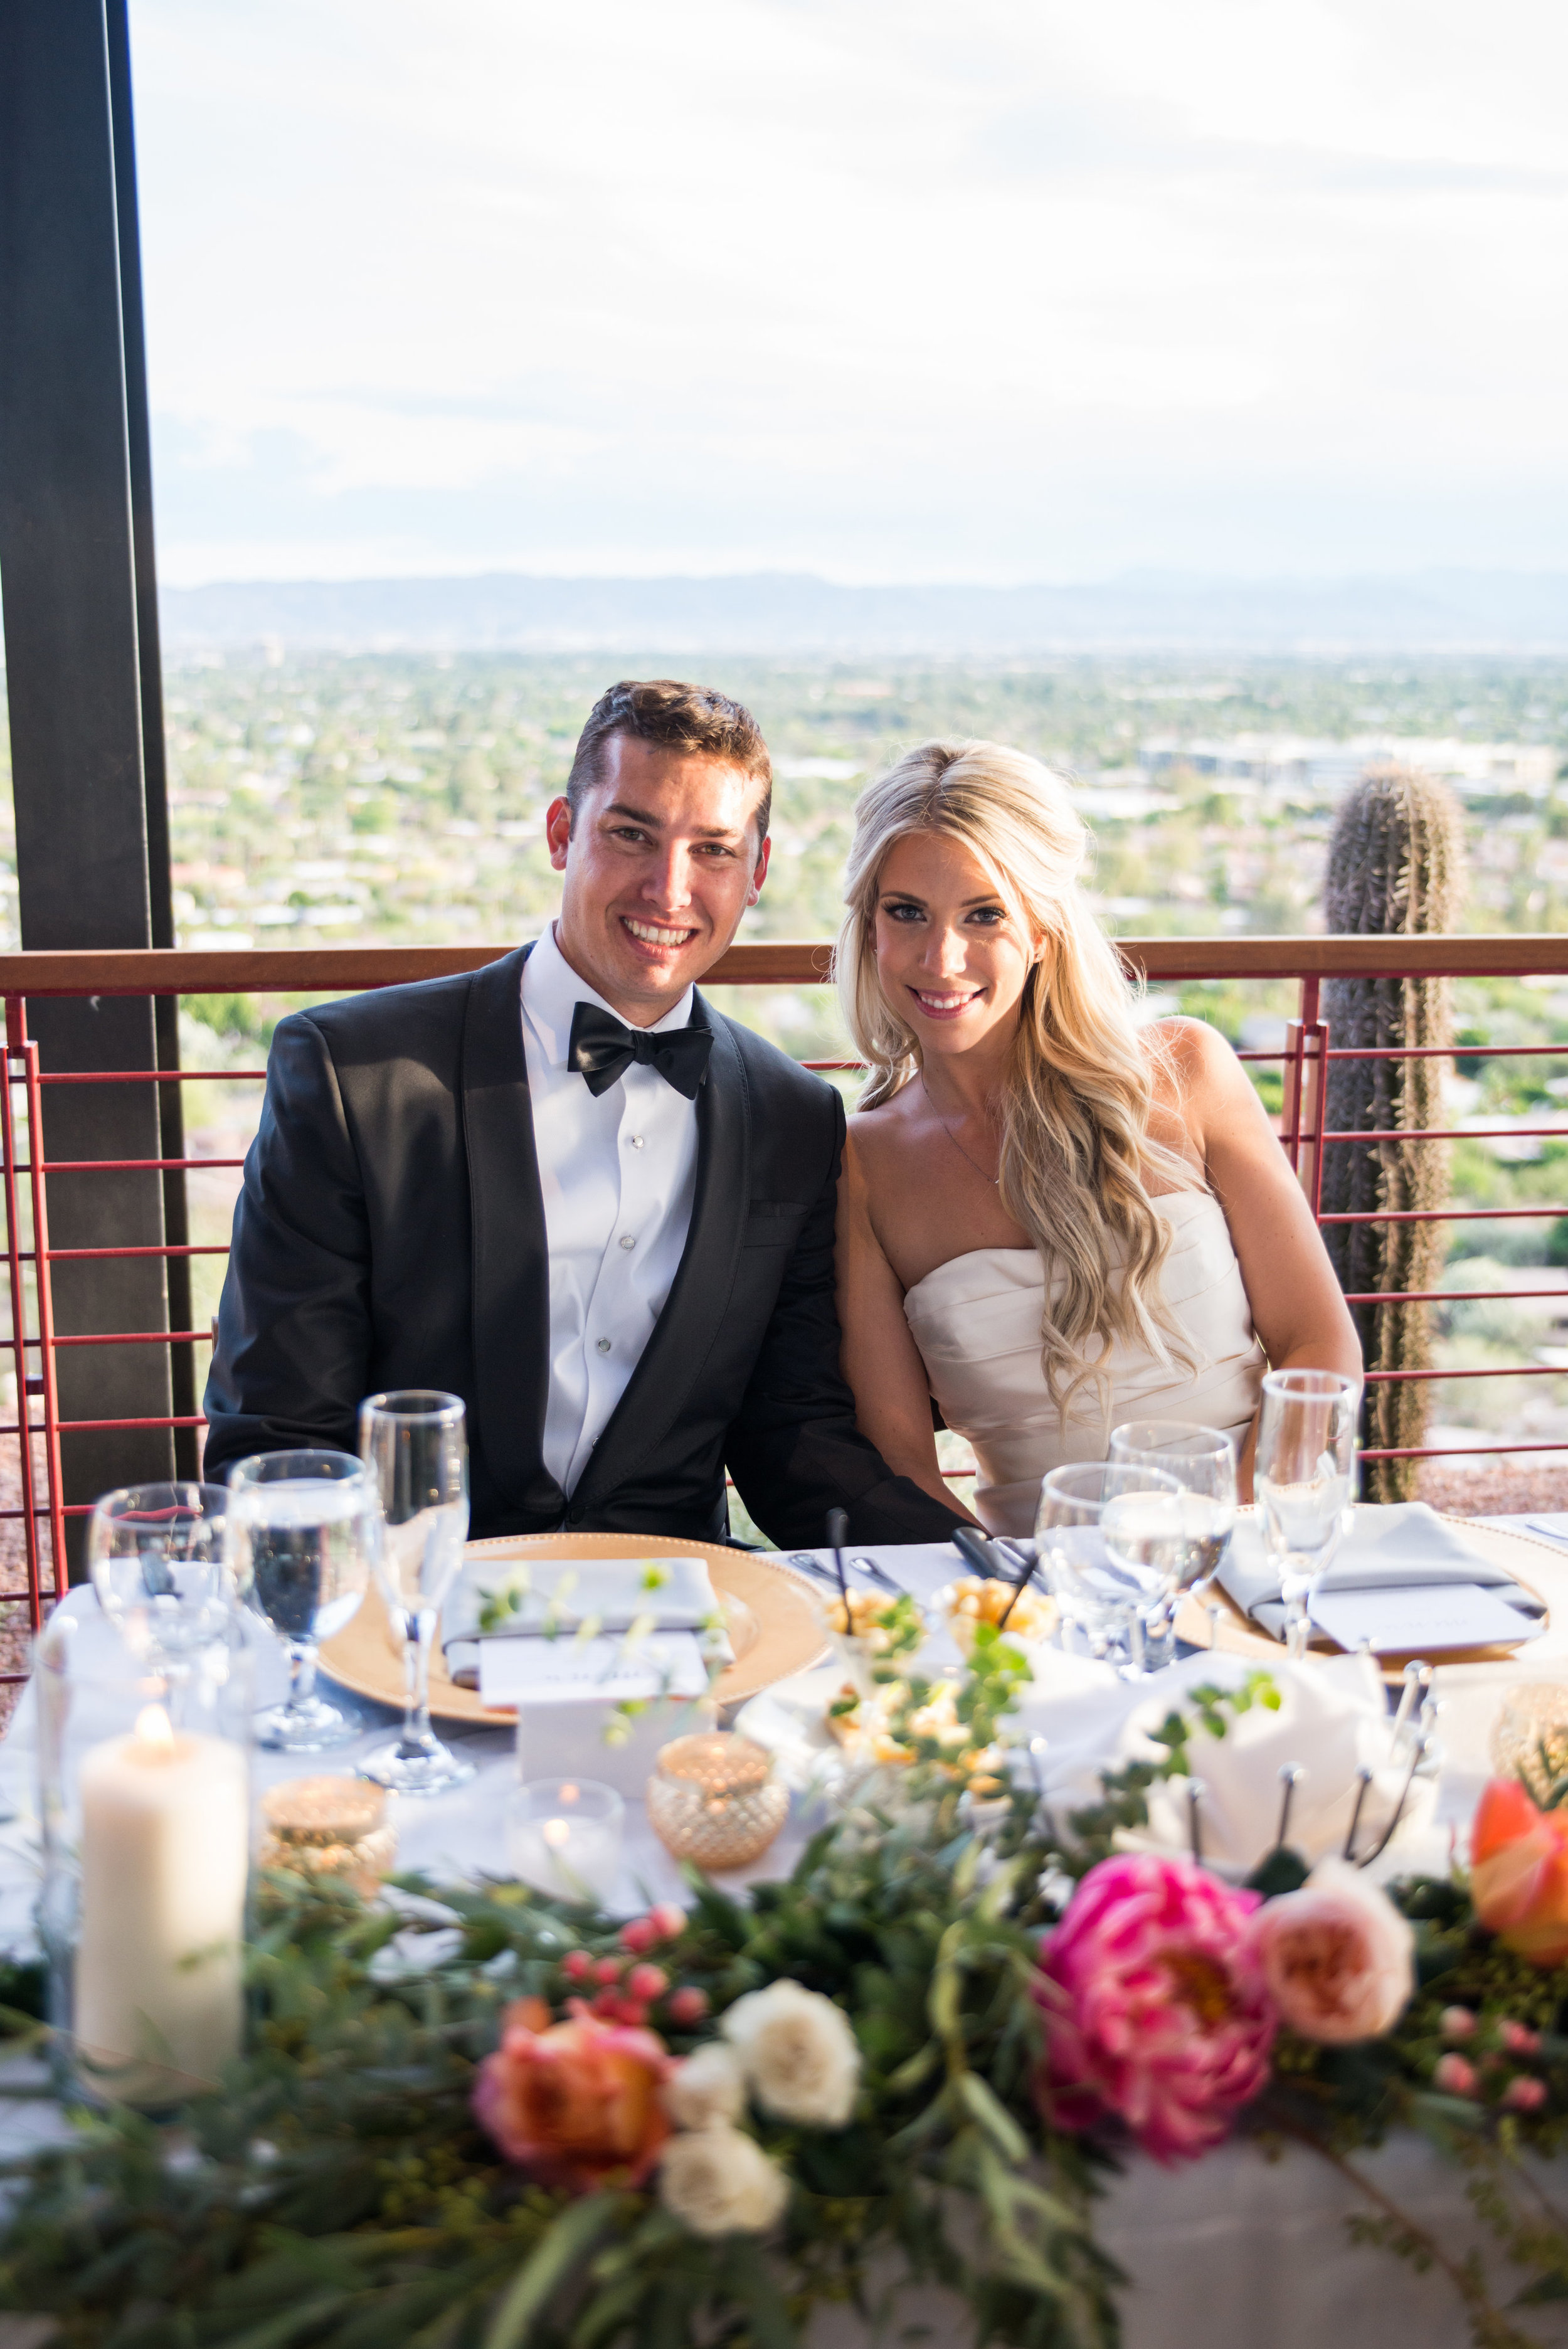 Scottsdale-wedding-planner-0154.jpg